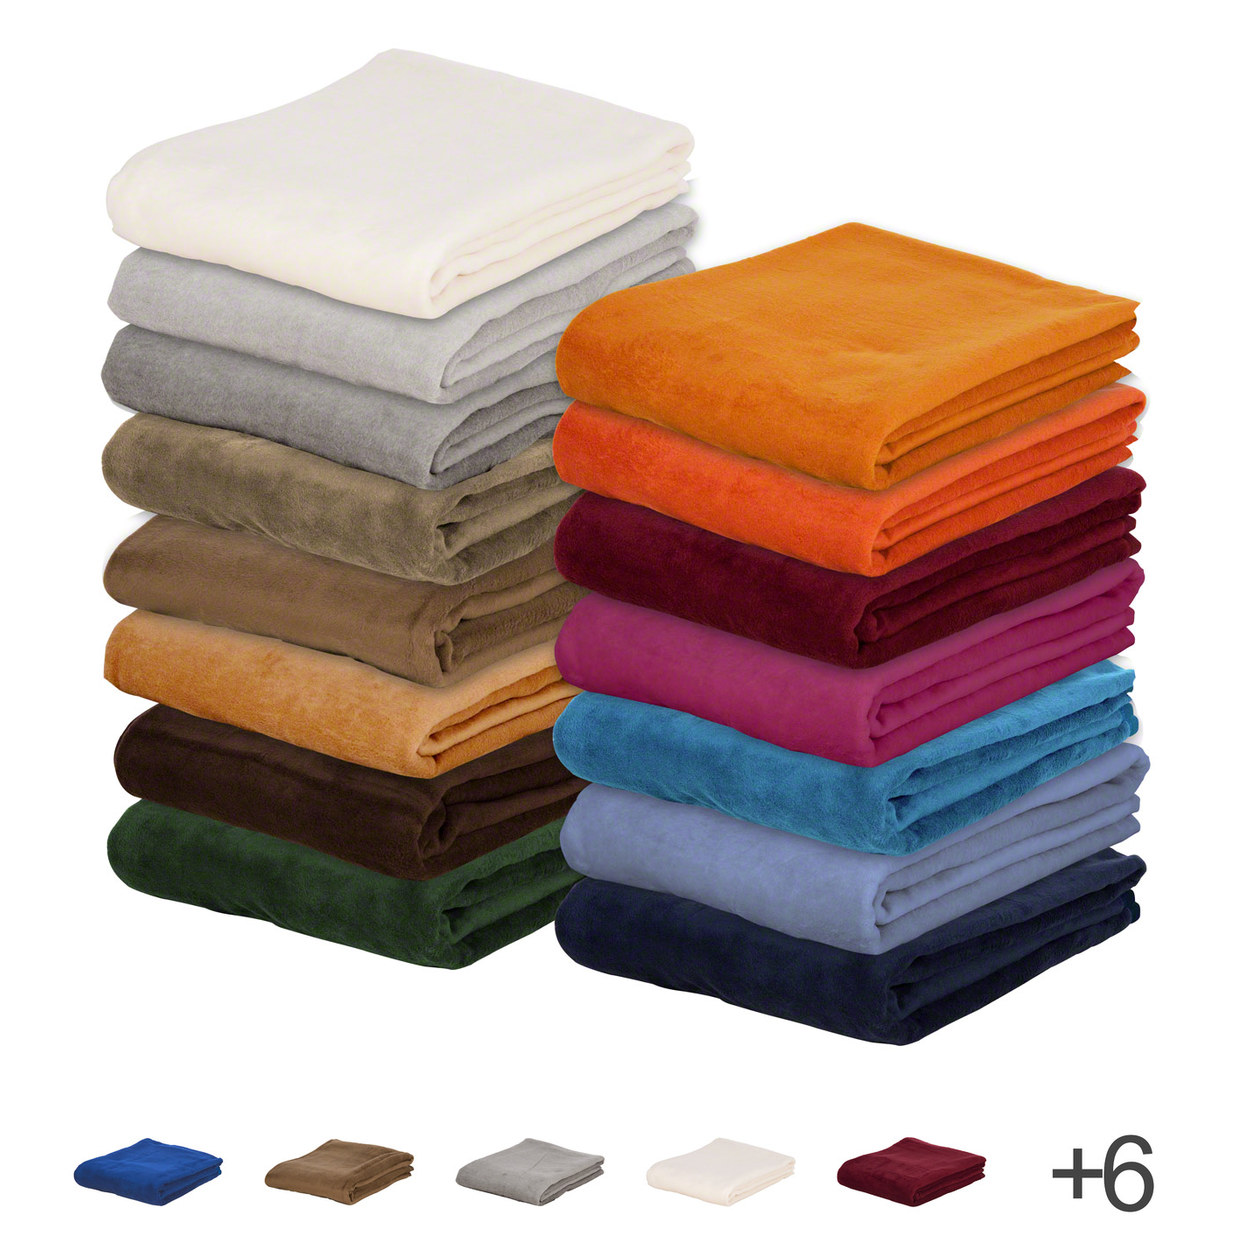 fangodecke orion cotton baumwolle tagesdecke wohndecke kuscheldecke 200 x 150 cm ebay. Black Bedroom Furniture Sets. Home Design Ideas